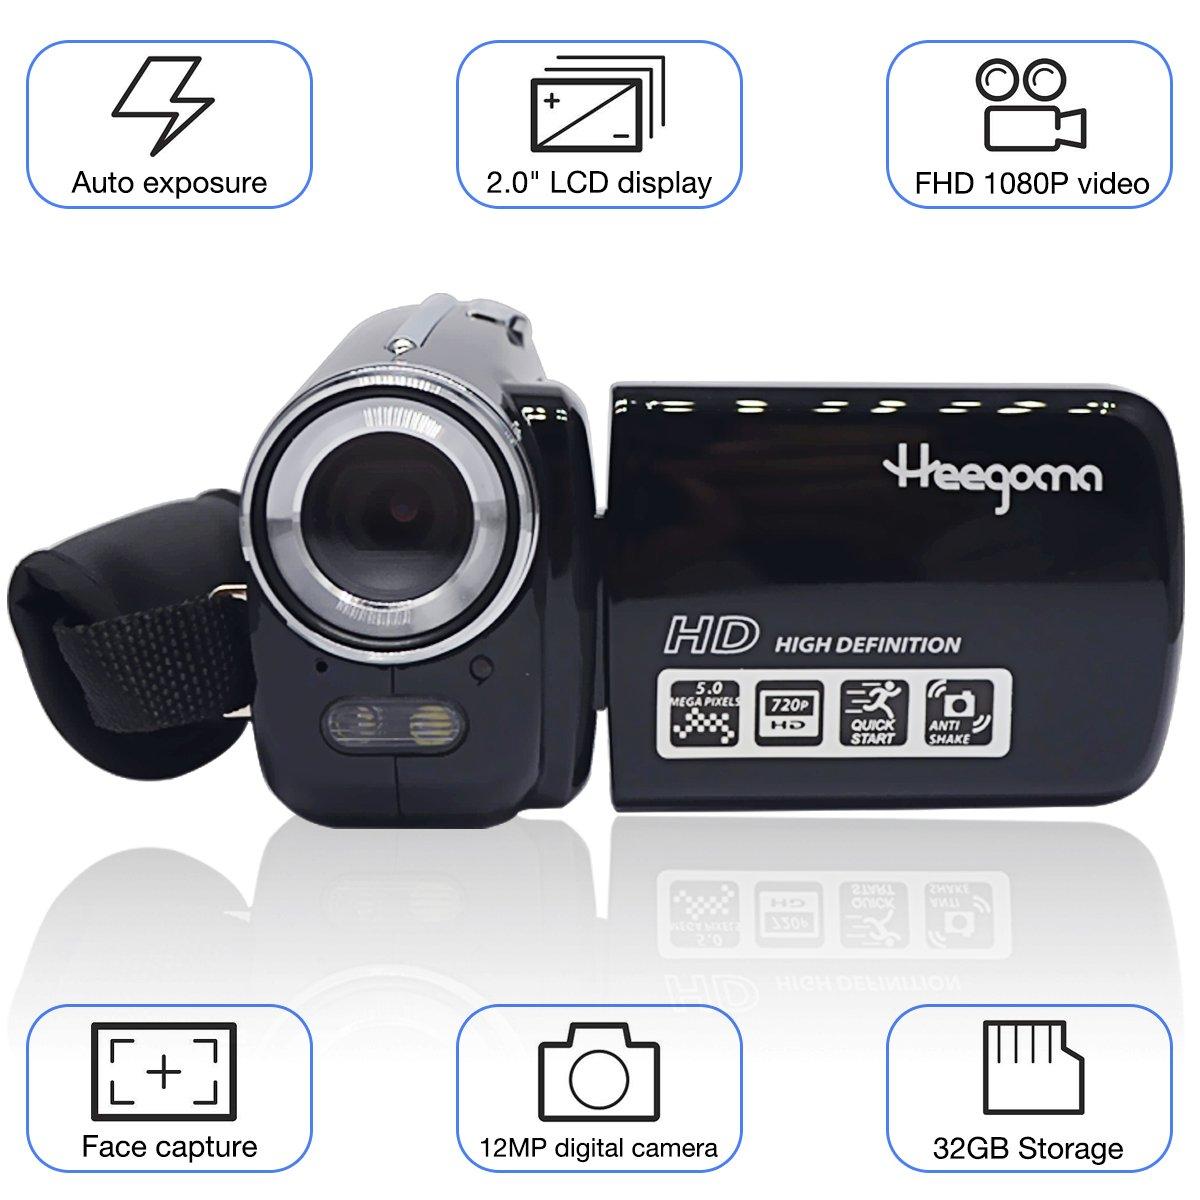 Digital Video Camcorder, Heegomn FHD 1080P 1920x1080 Video Camera 2.0'' LCD 12MP Digital Video Recorder with 270 Degree Rotation Screen, Black